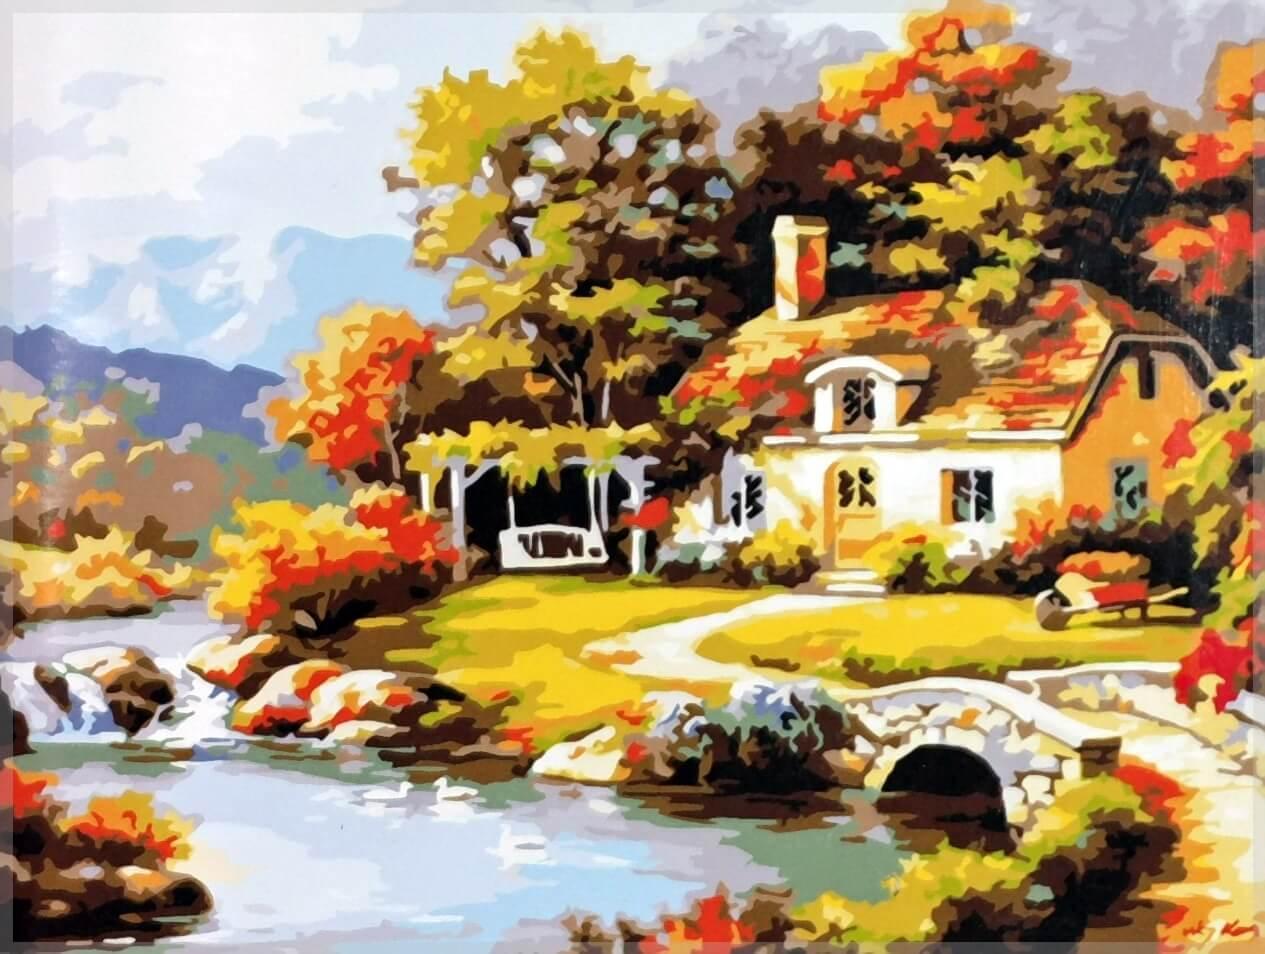 Картина по номерам Уютный дом у реки. Худ. Ким Сунг, 40x50 см., Babylon